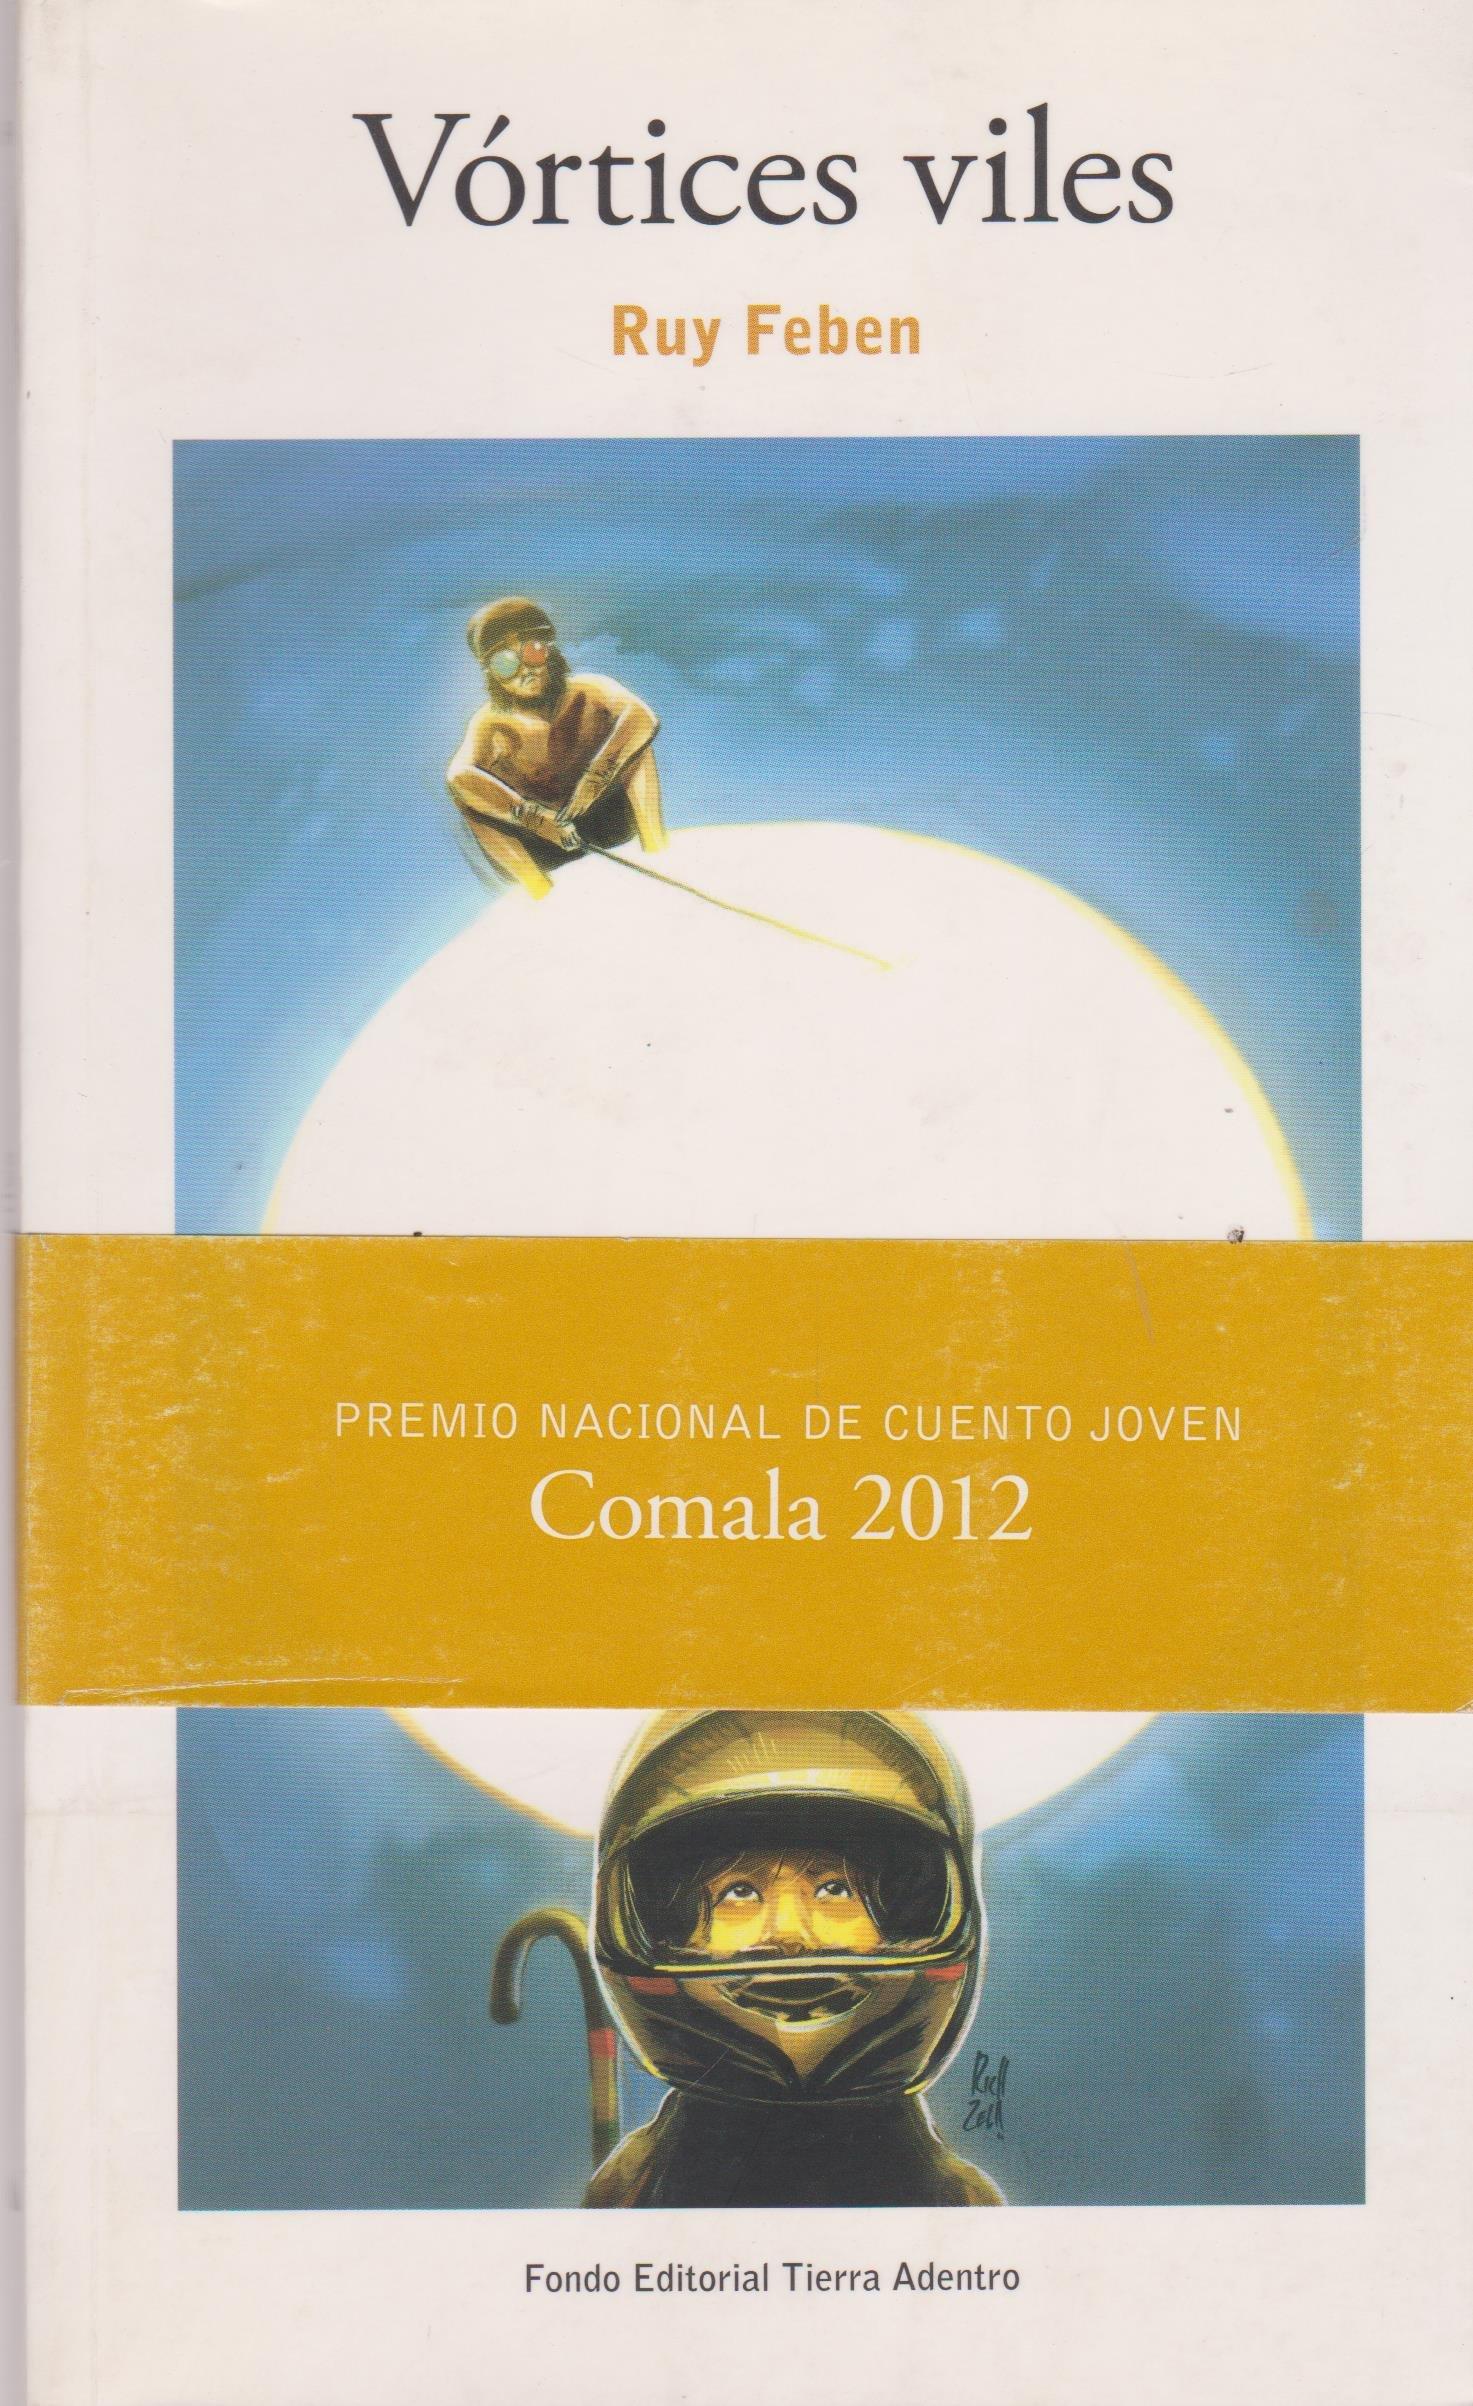 Vortices viles (Spanish Edition): Ruy Feben: 9786075160382: Amazon.com: Books